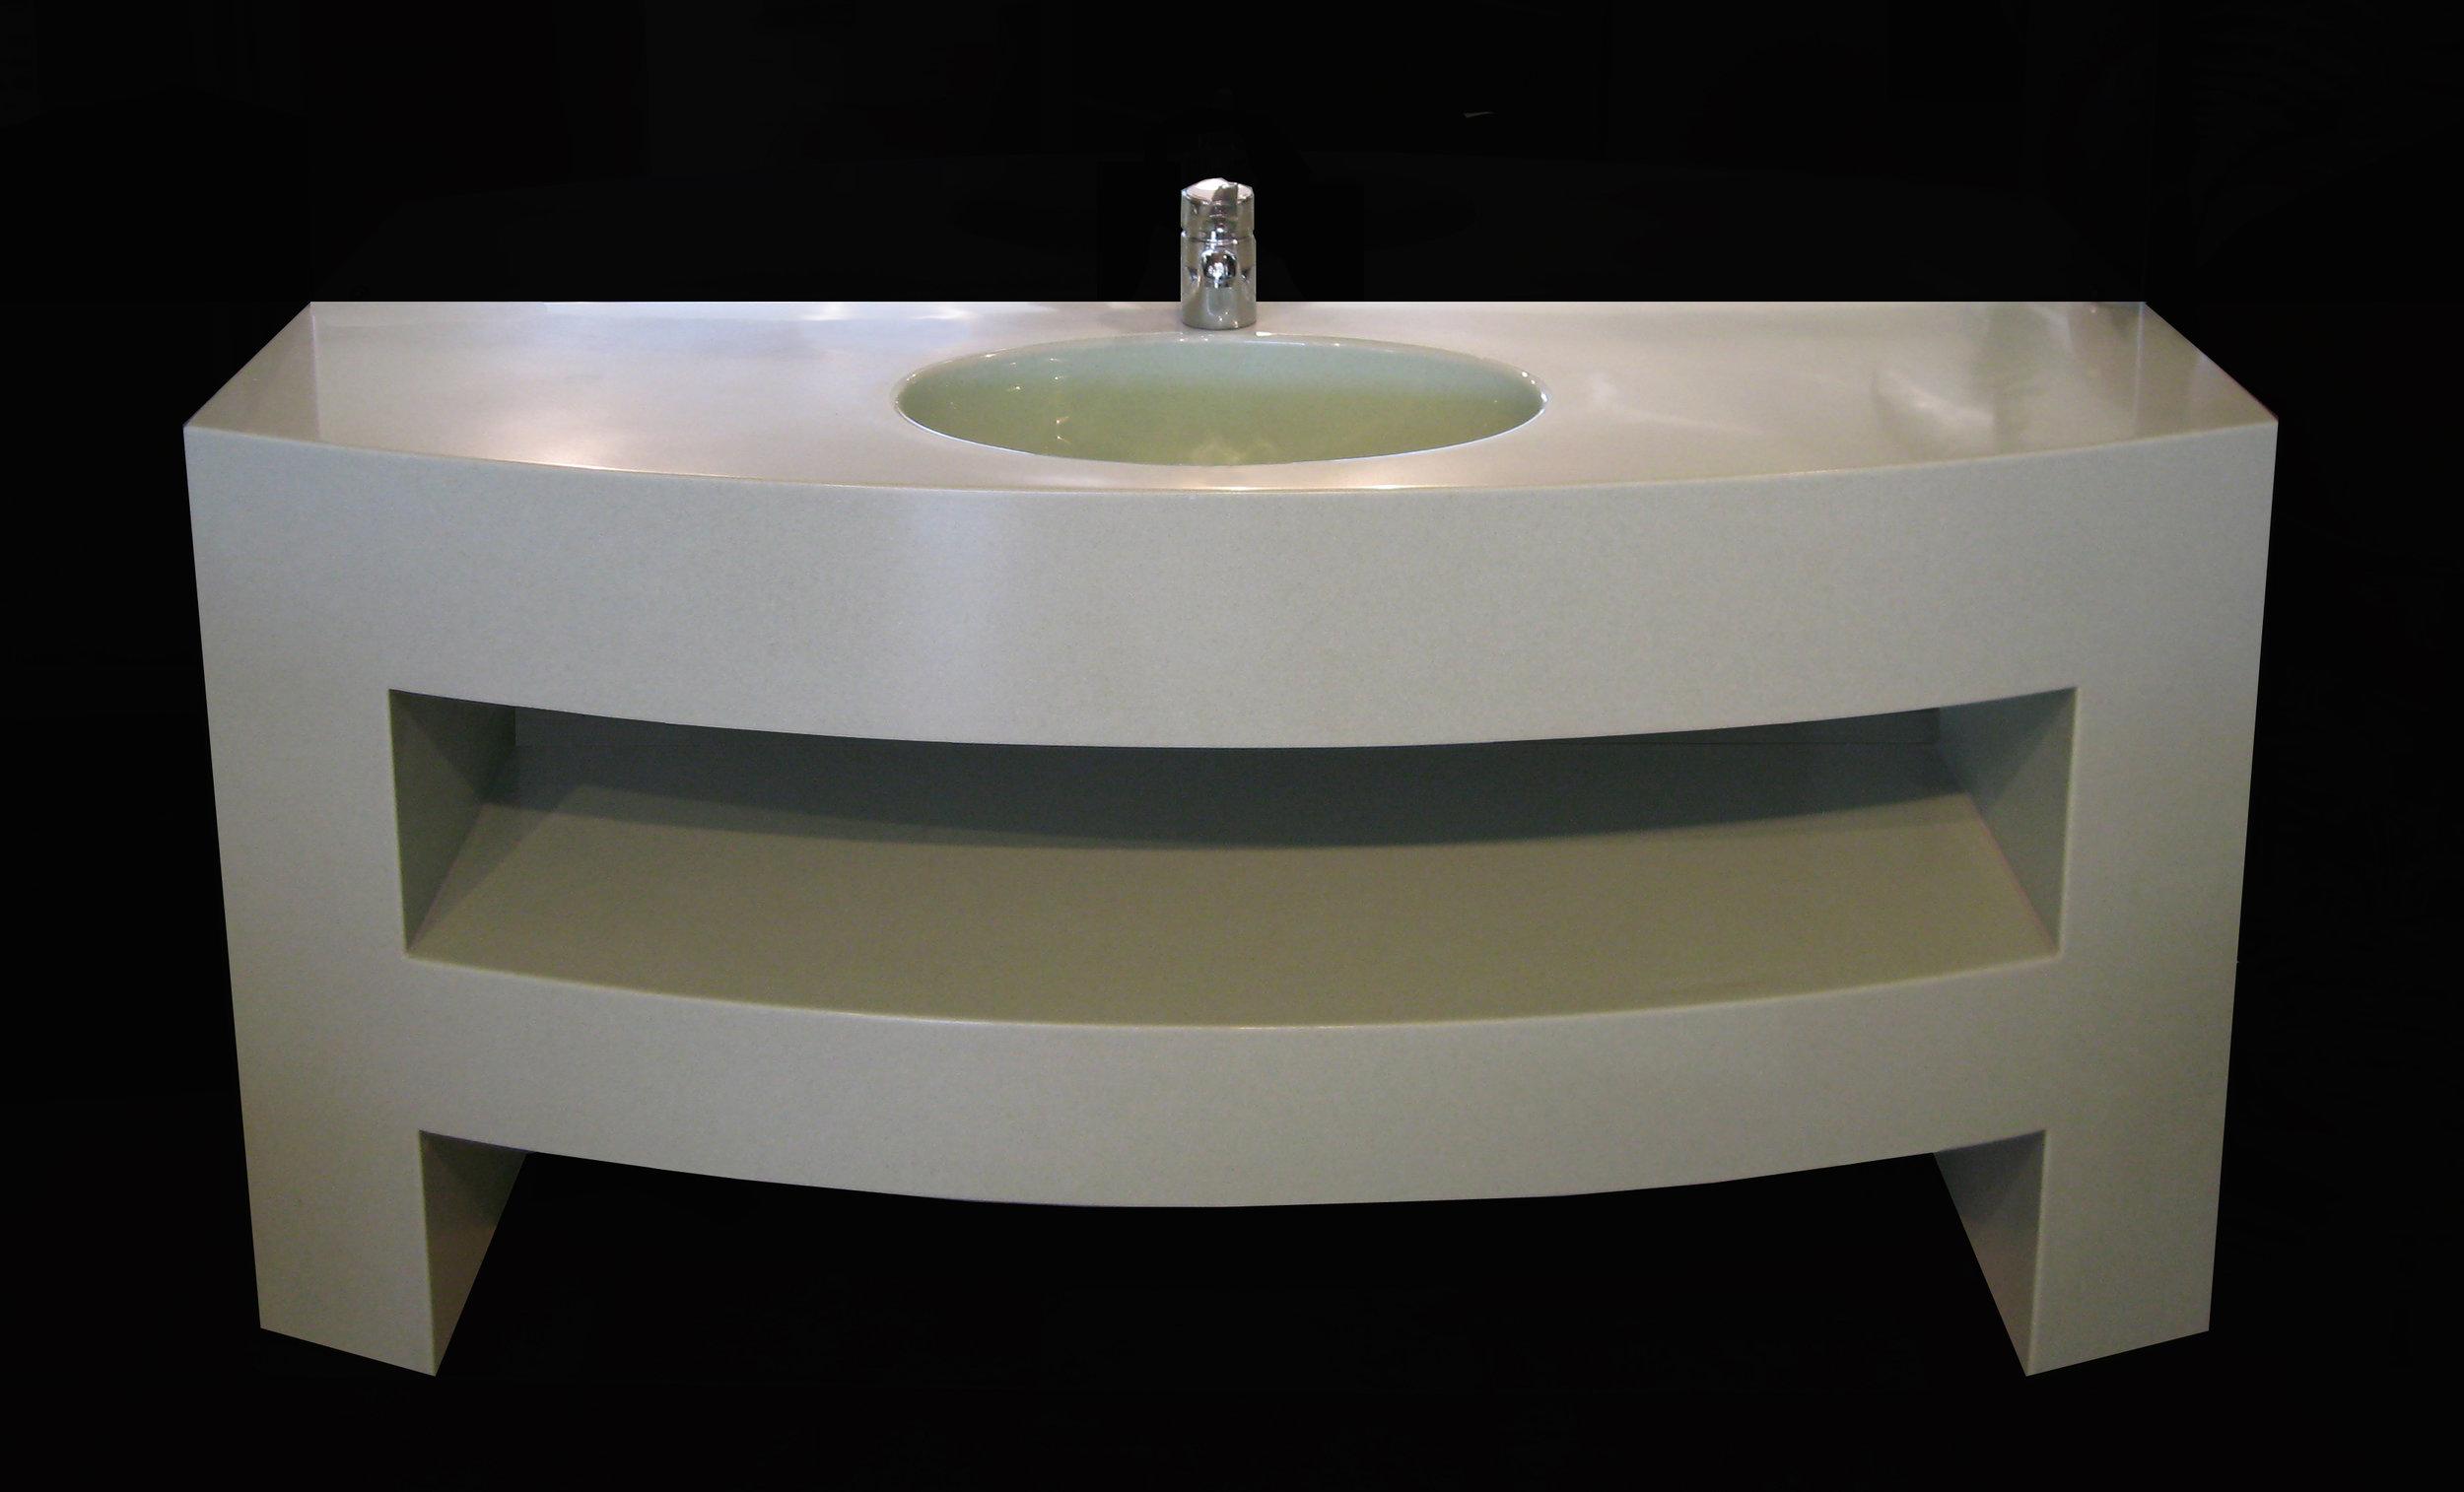 tarragon 1 piece vanity.jpg